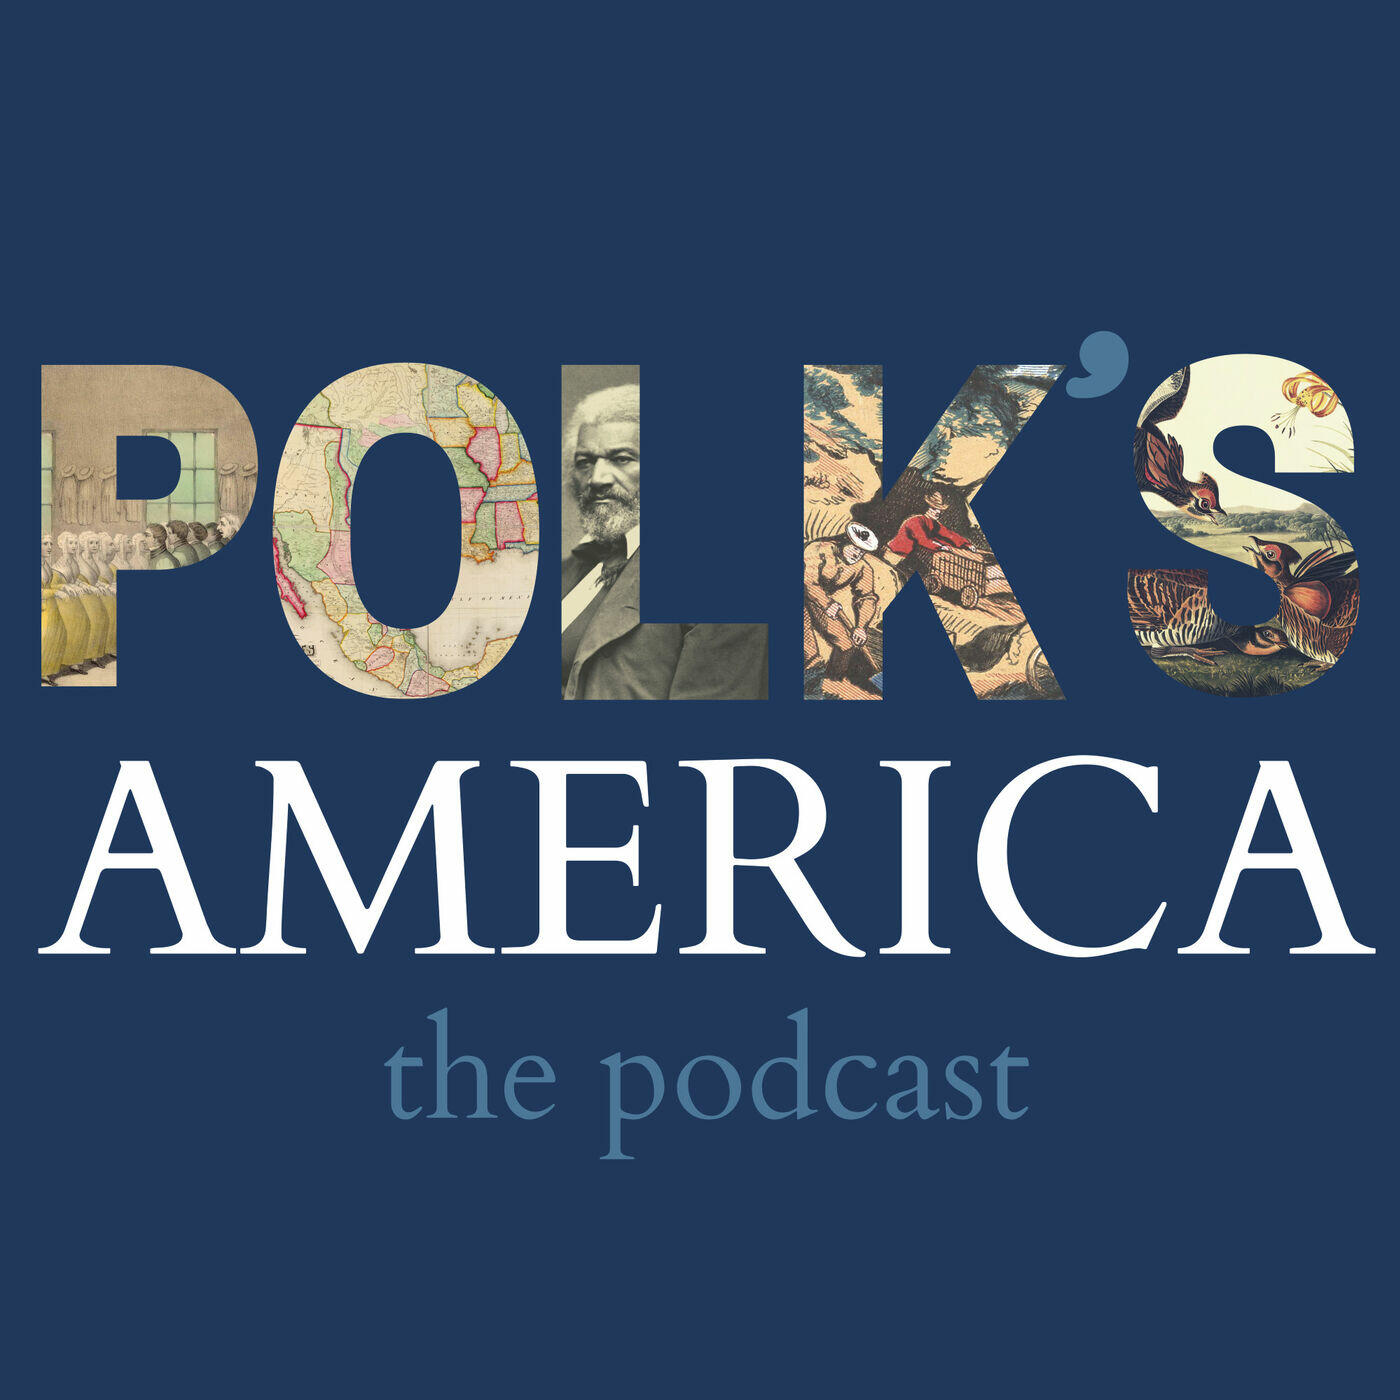 Polk's America